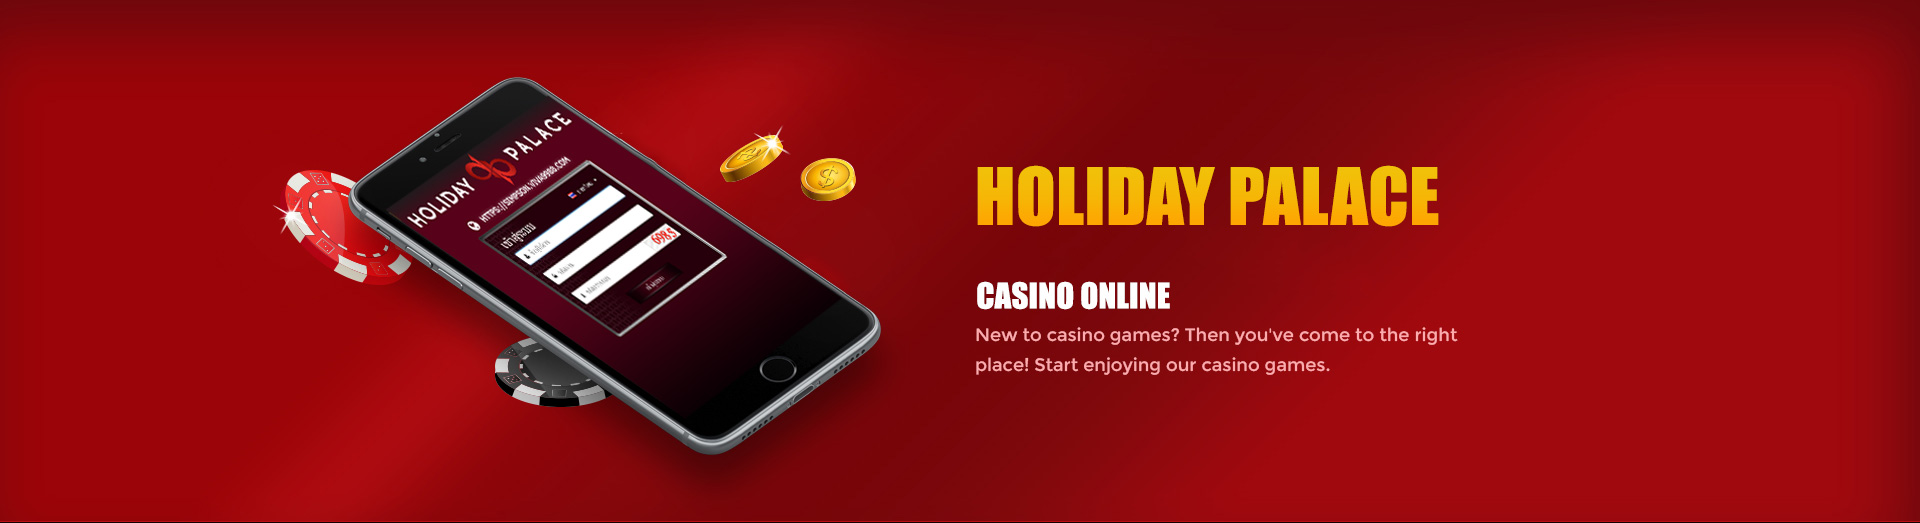 holiday palace casino banner